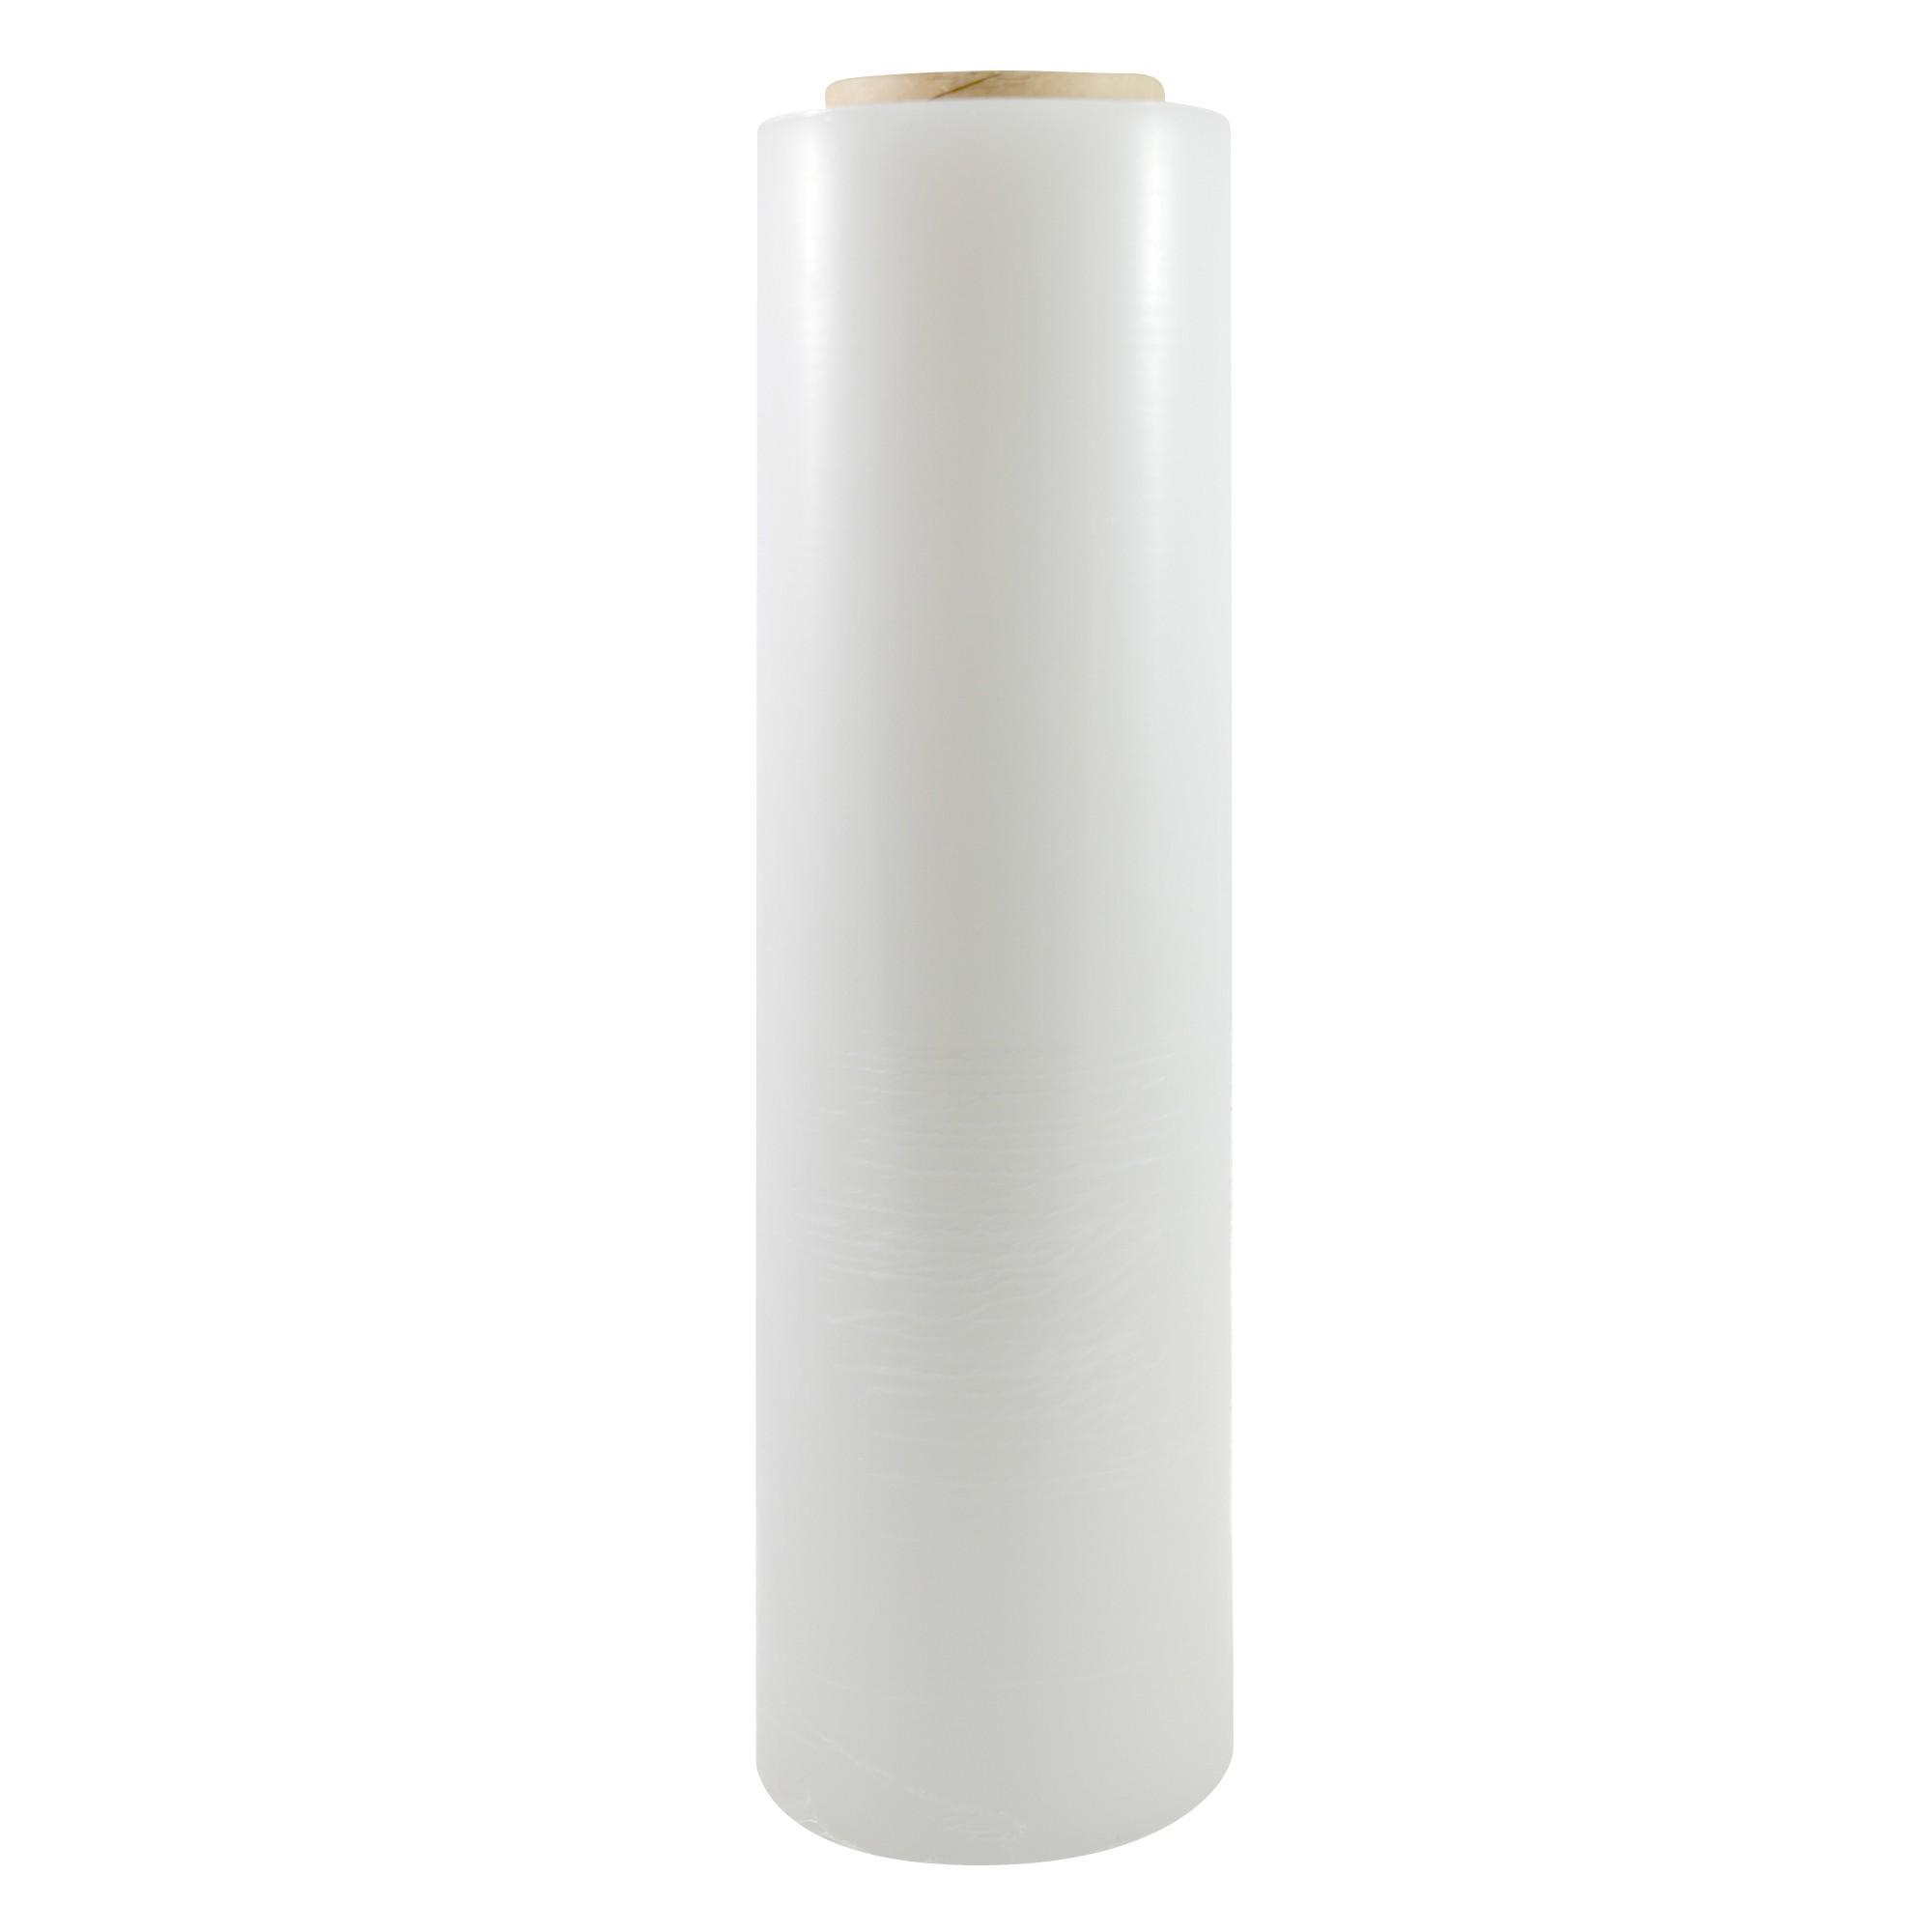 "TOTALPACK® 15"" x 1000' 85 Gauge, 4 Rolls. Gauge Blown Stretch Clear Film"